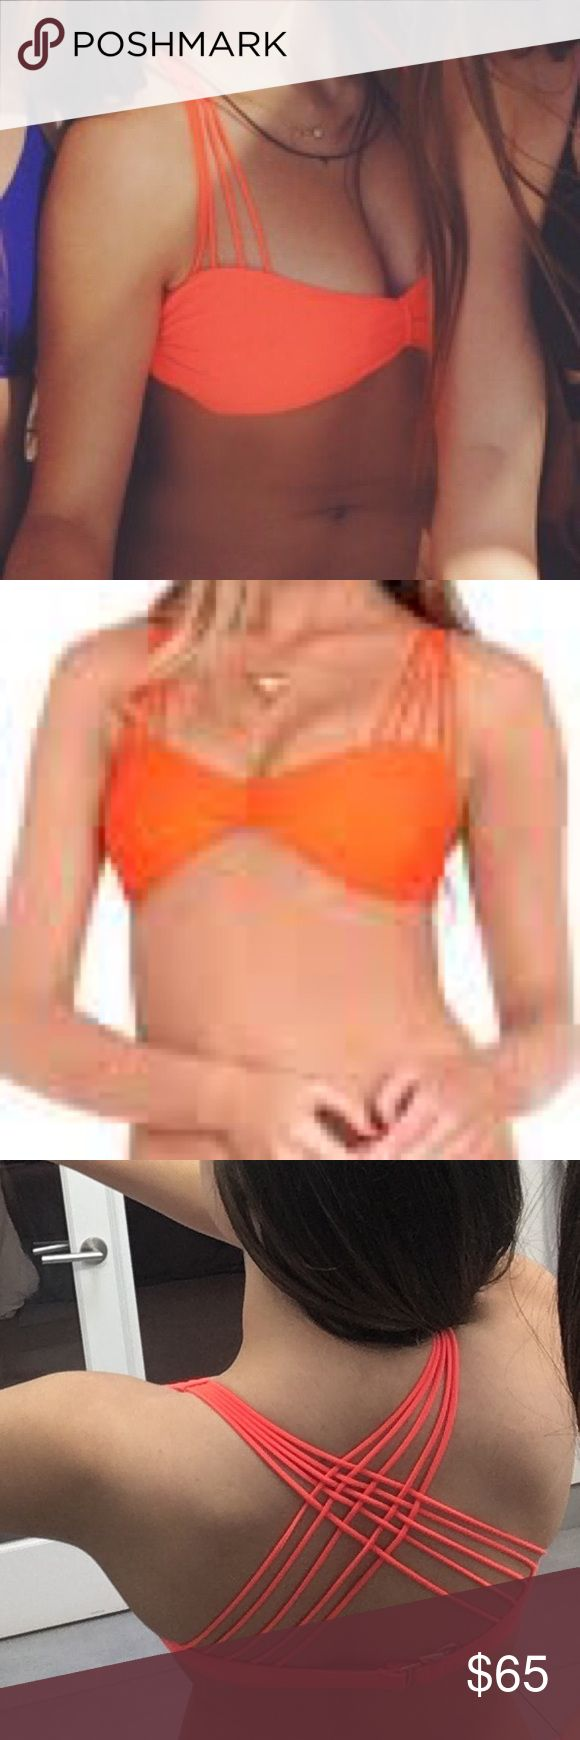 Luli Fama Orange Bandeau Top So cute for summer! Worn once! Fits sizes A-C Luli Fama Swim Bikinis